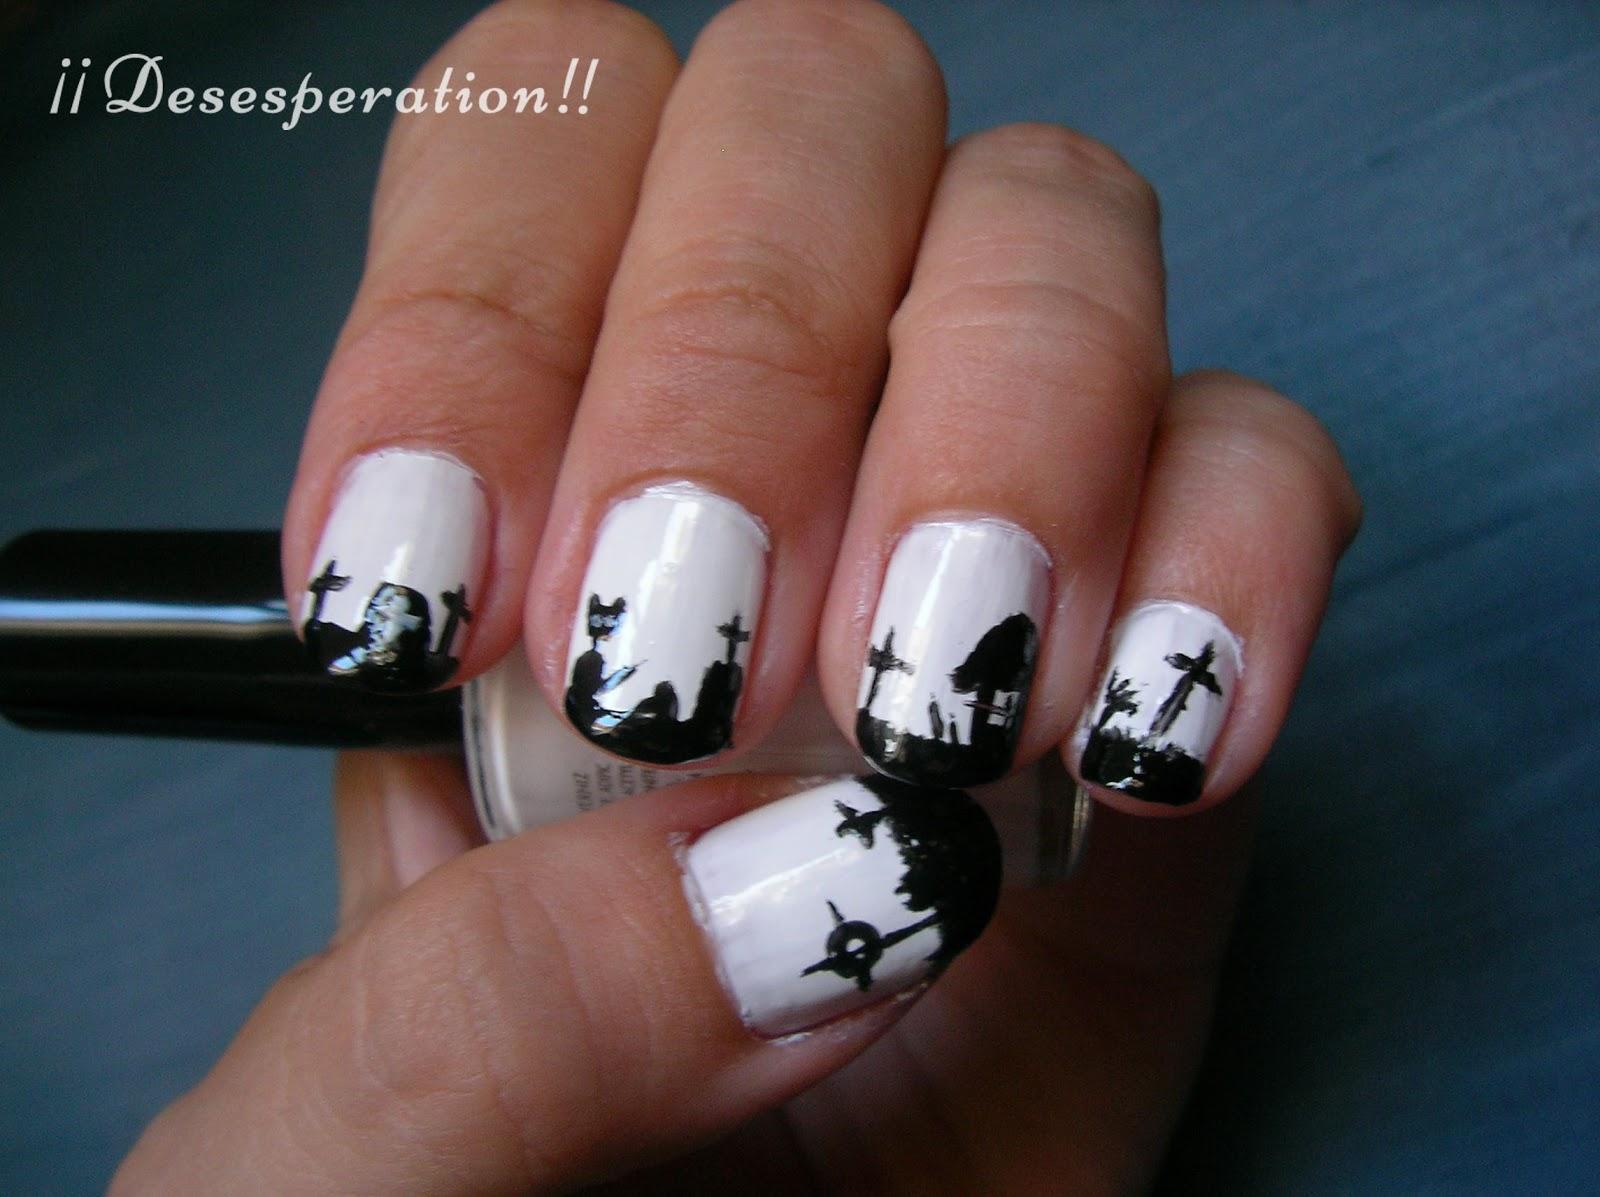 Desesperation!!: Diseño uñas - Cementerio Halloween